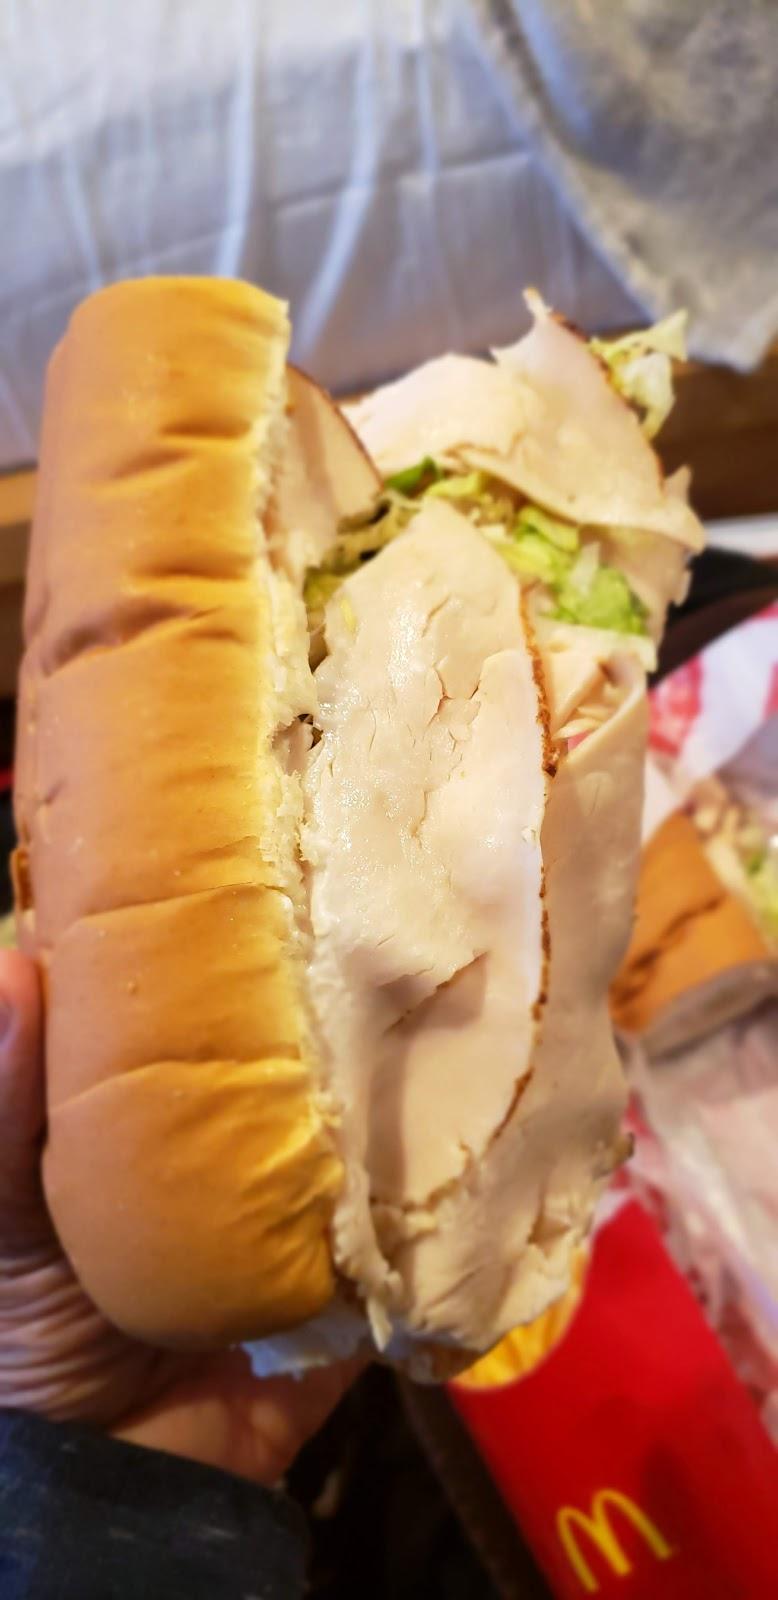 Angelinas Submarine Shop - meal takeaway  | Photo 2 of 9 | Address: 34 1/2 Columbia St, Adams, MA 01220, USA | Phone: (413) 743-9744